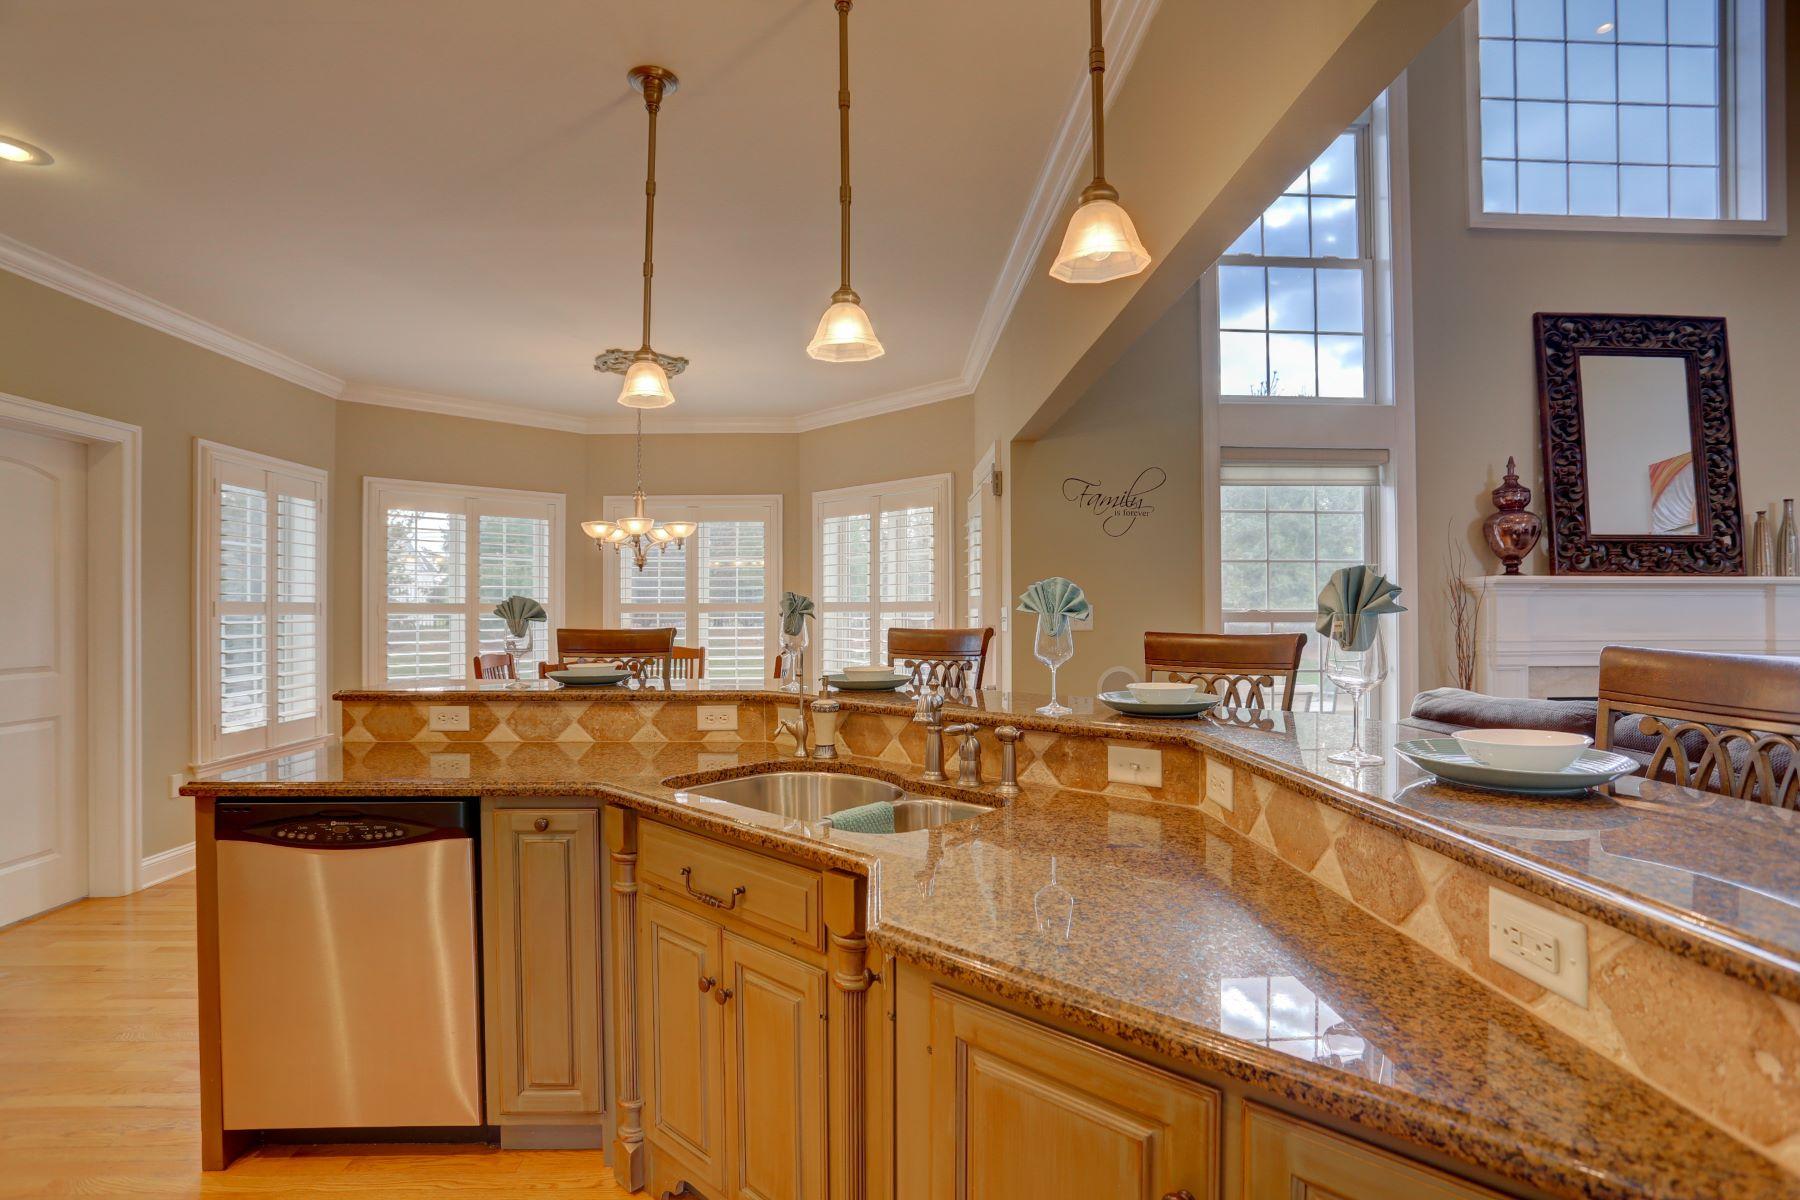 Additional photo for property listing at 1125 N Bristol Drive 1125 N Bristol Drive Lititz, Pennsylvania 17543 Estados Unidos